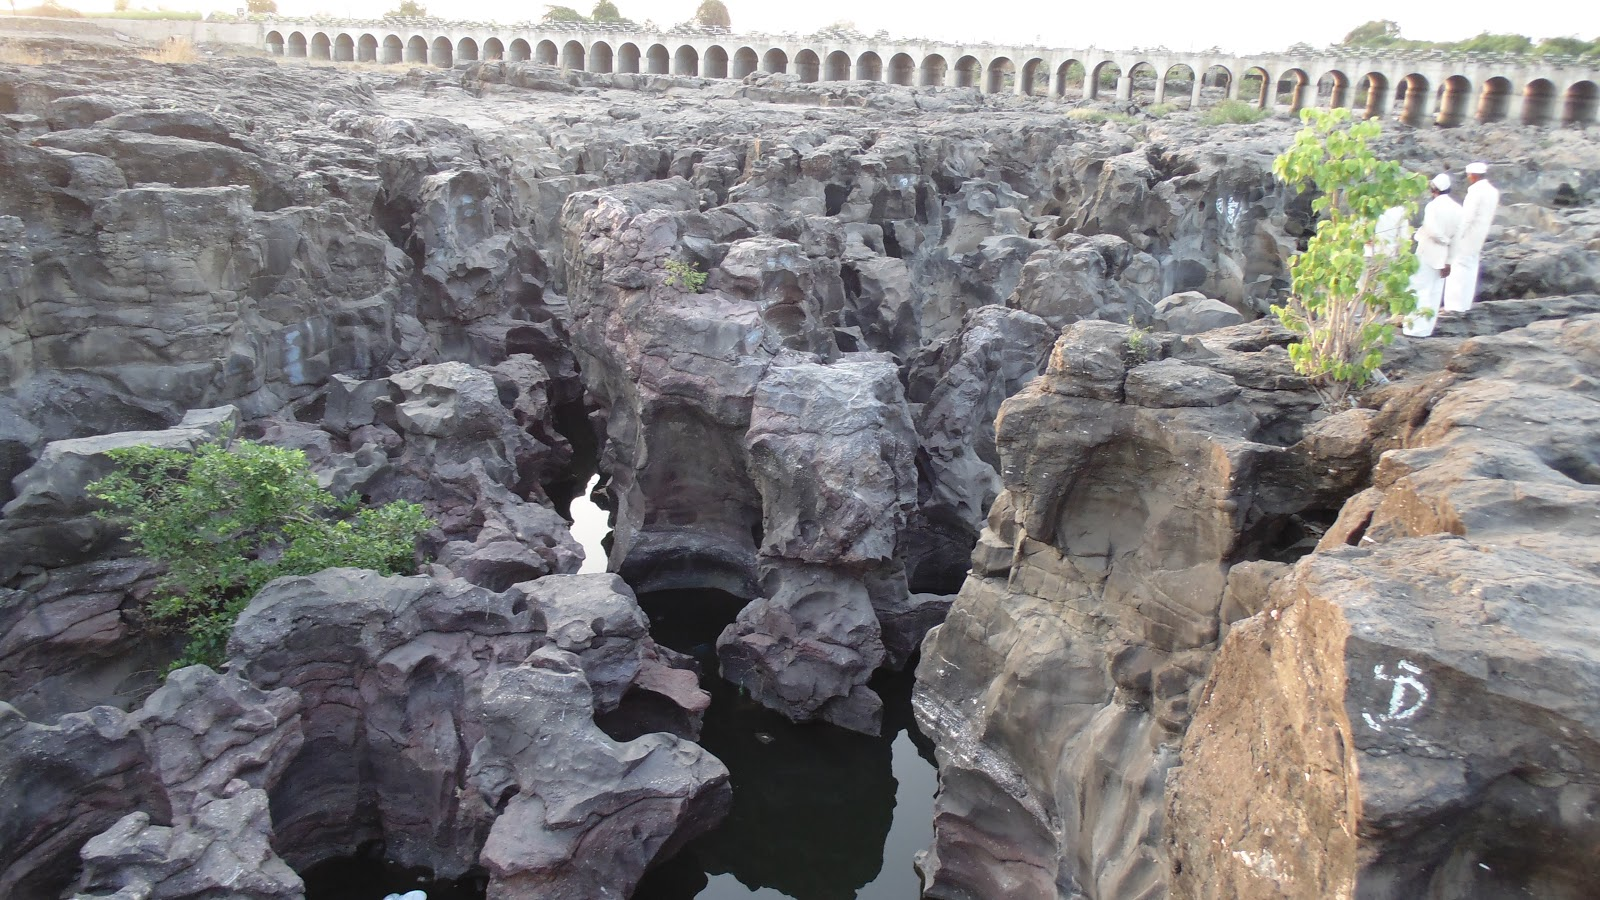 Nighoj village potholes (kund)on Kukadi river near pune